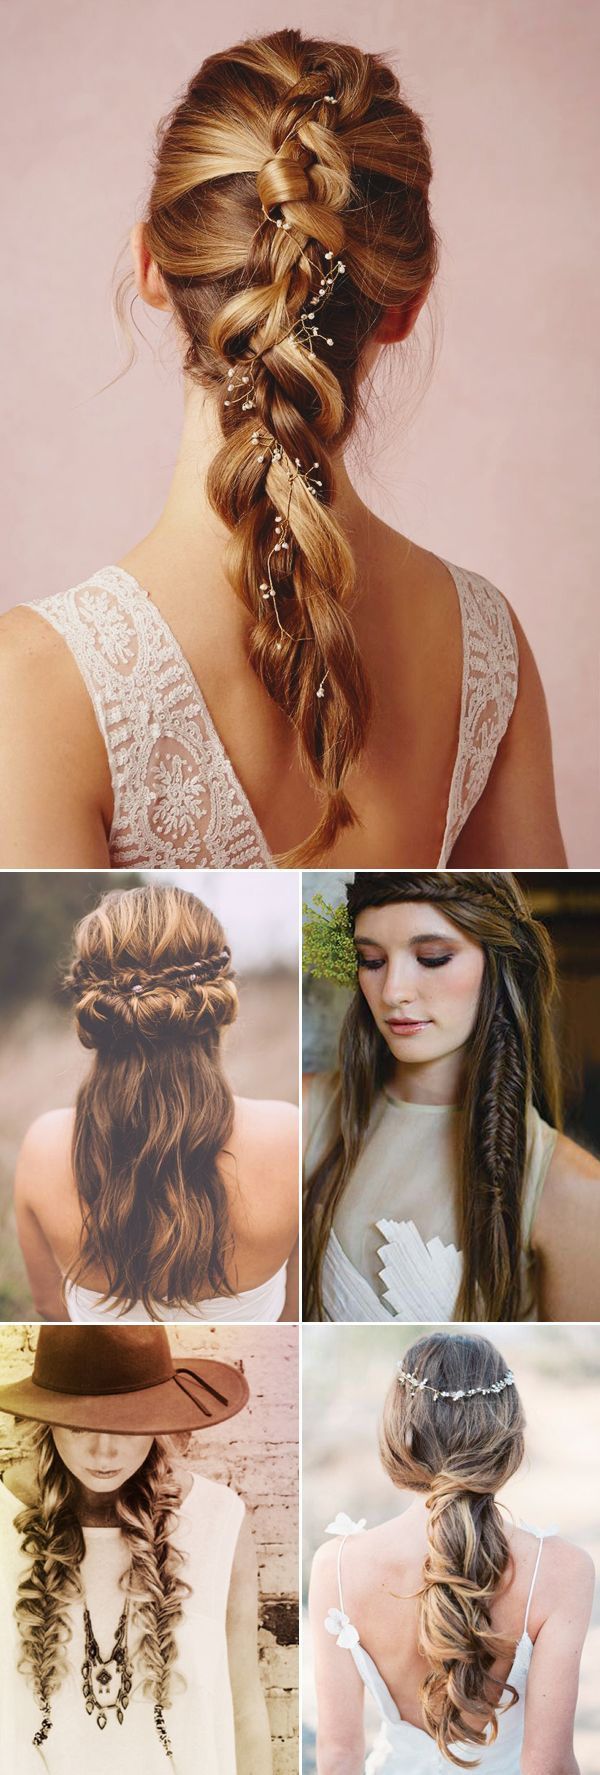 28 fancy braided hairstyles for long hair 2016 - pretty designs